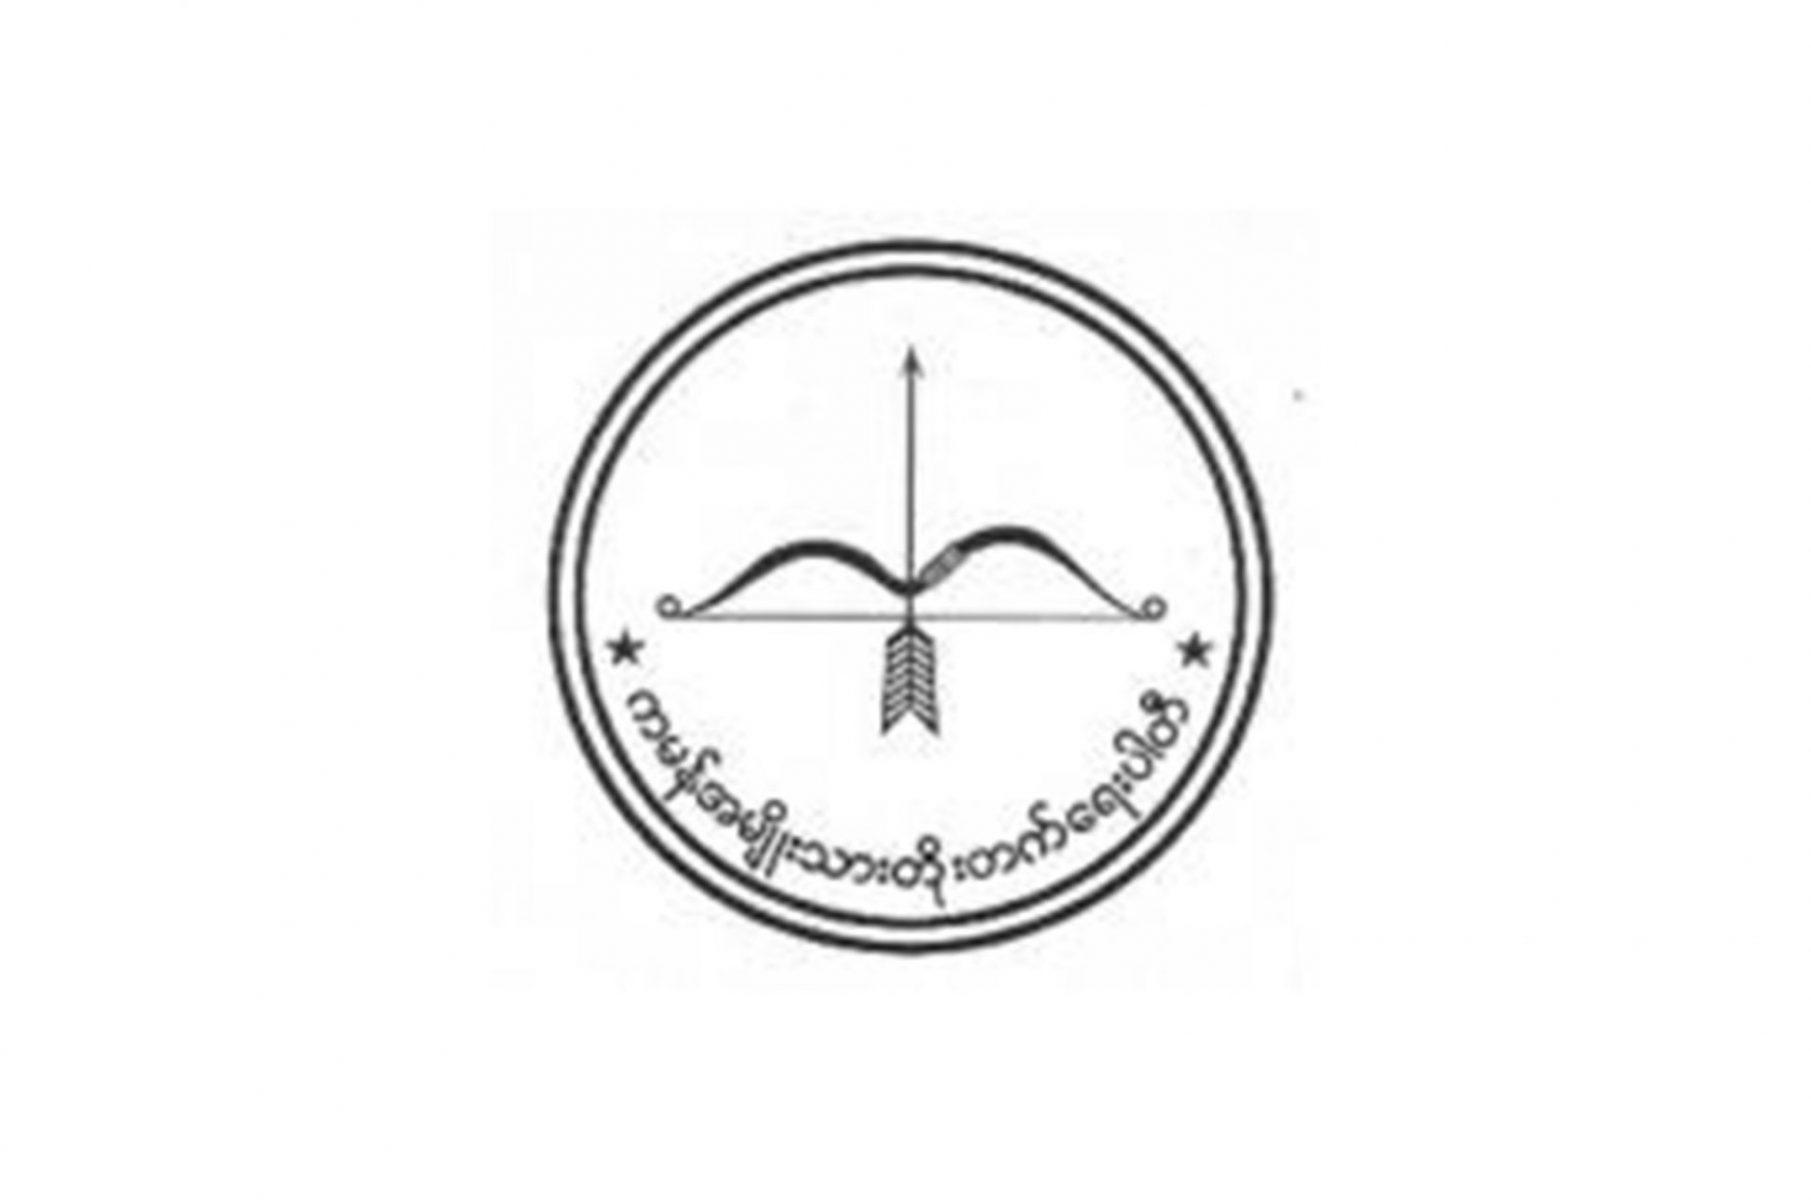 Kaman National Devlopment Party Logo scaled